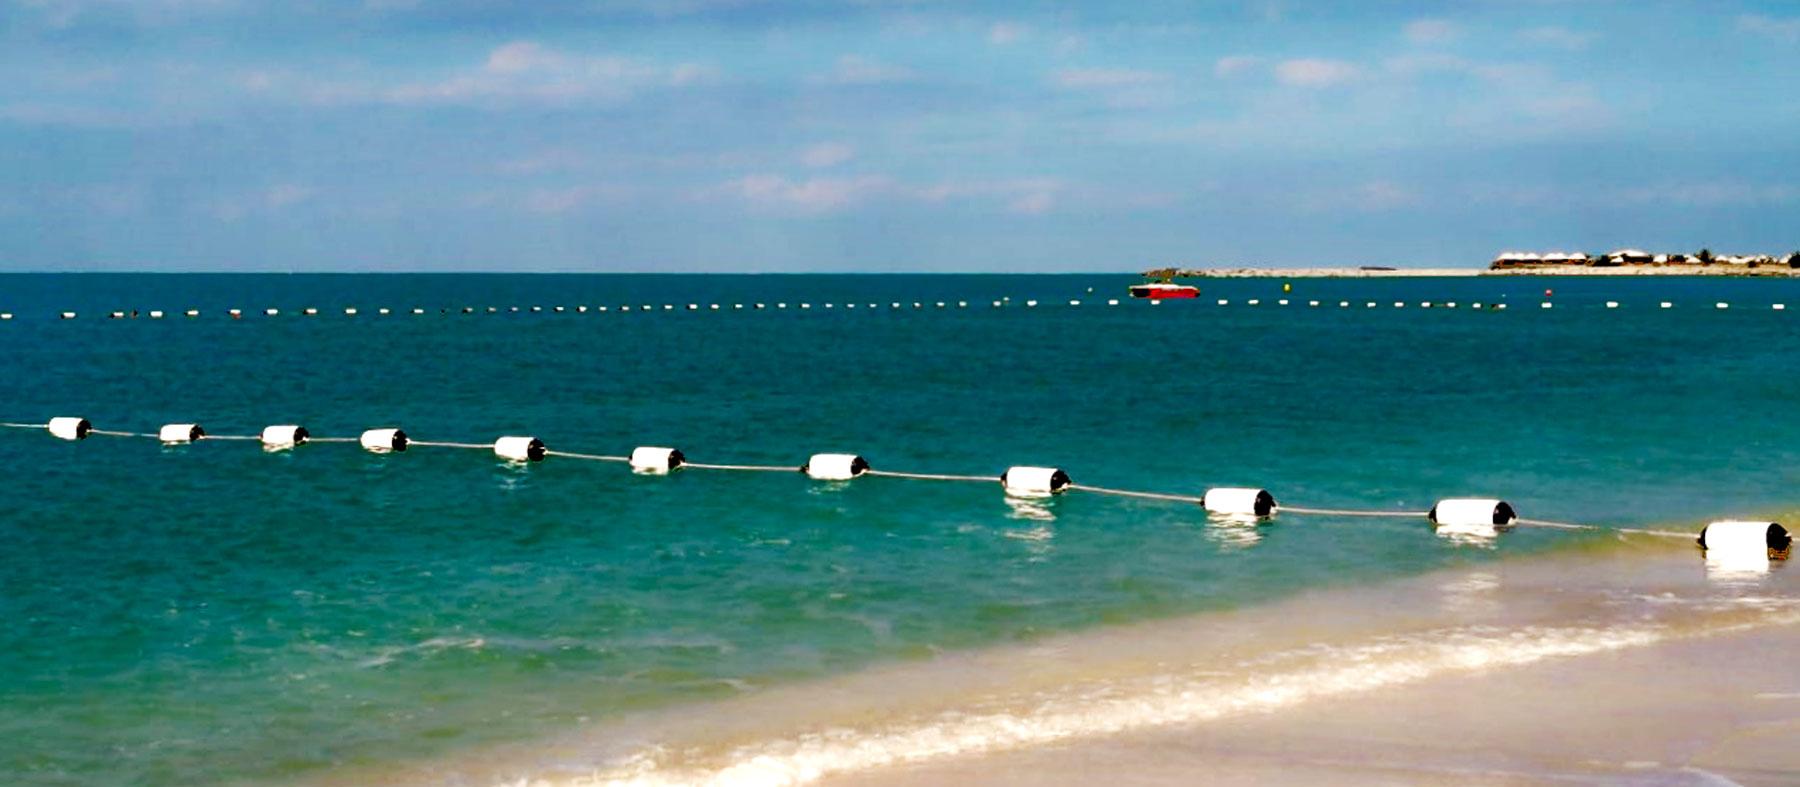 beachmarine-and-port-service-uae